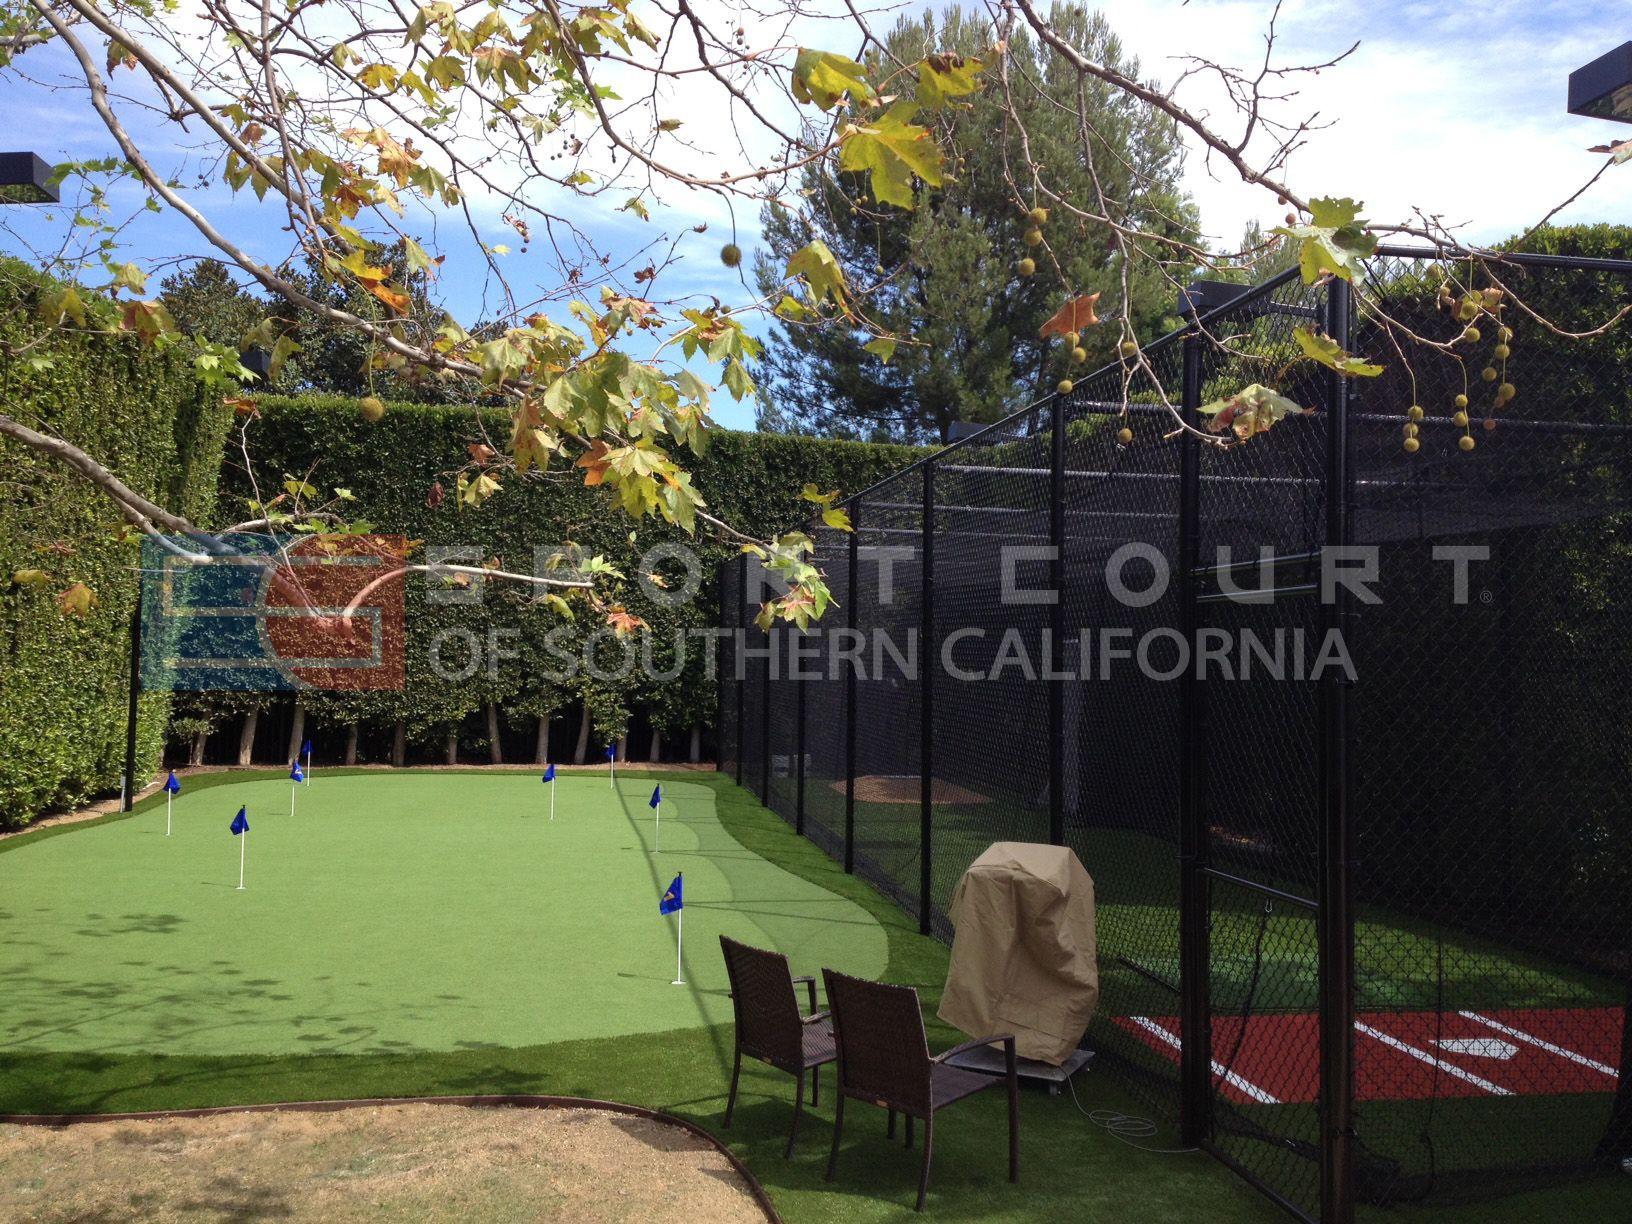 custom backyard batting cage with custom backyard putting green